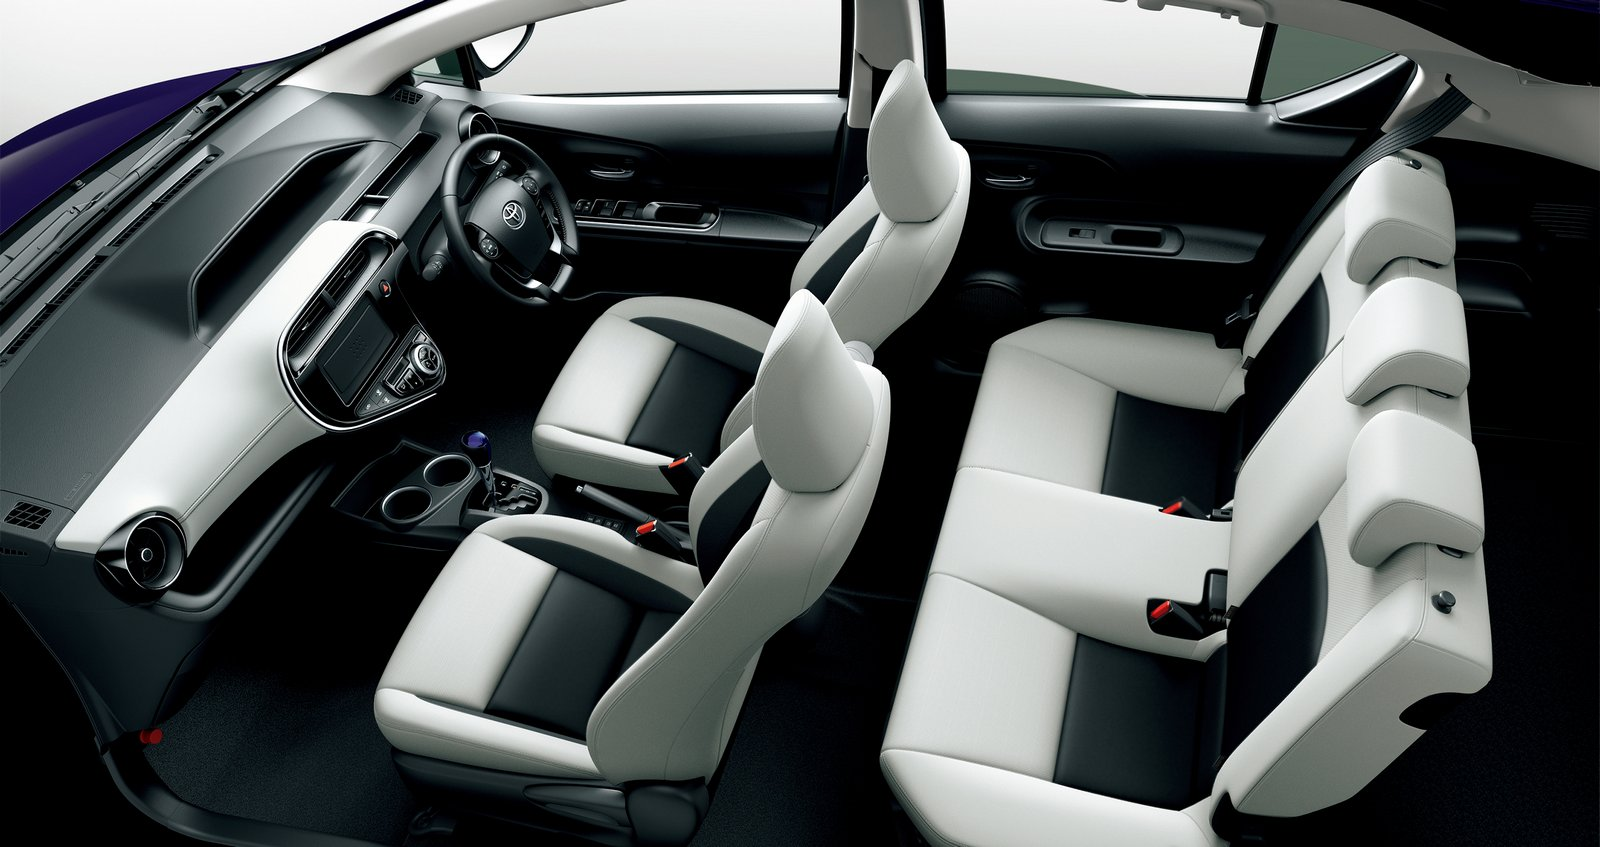 2018_Toyota_Aqua_facelift_11